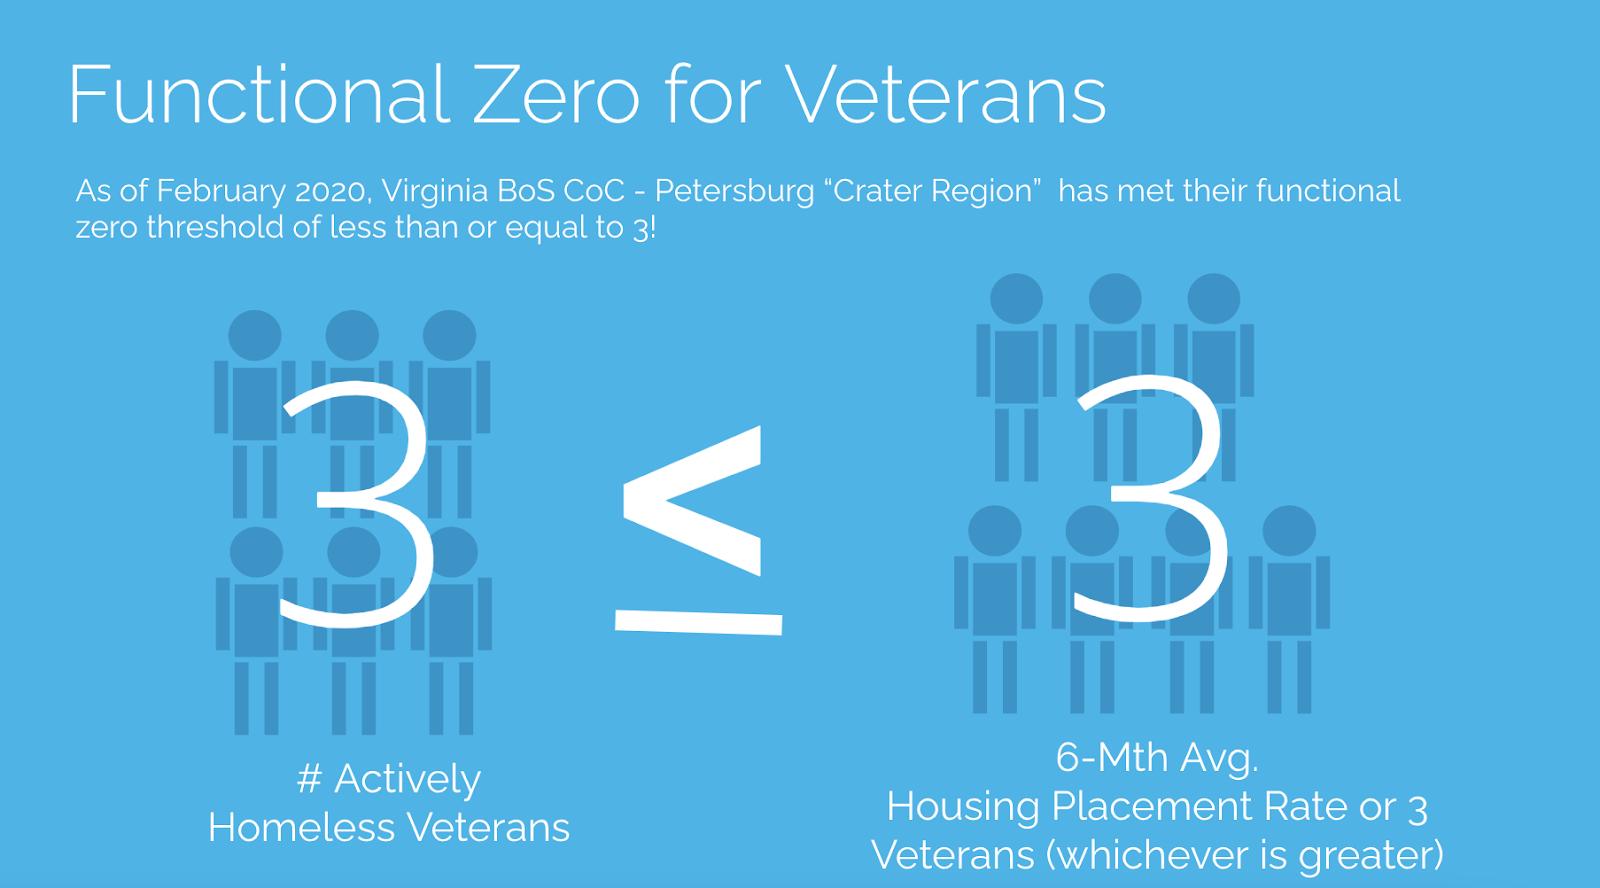 Functional zero for veterans